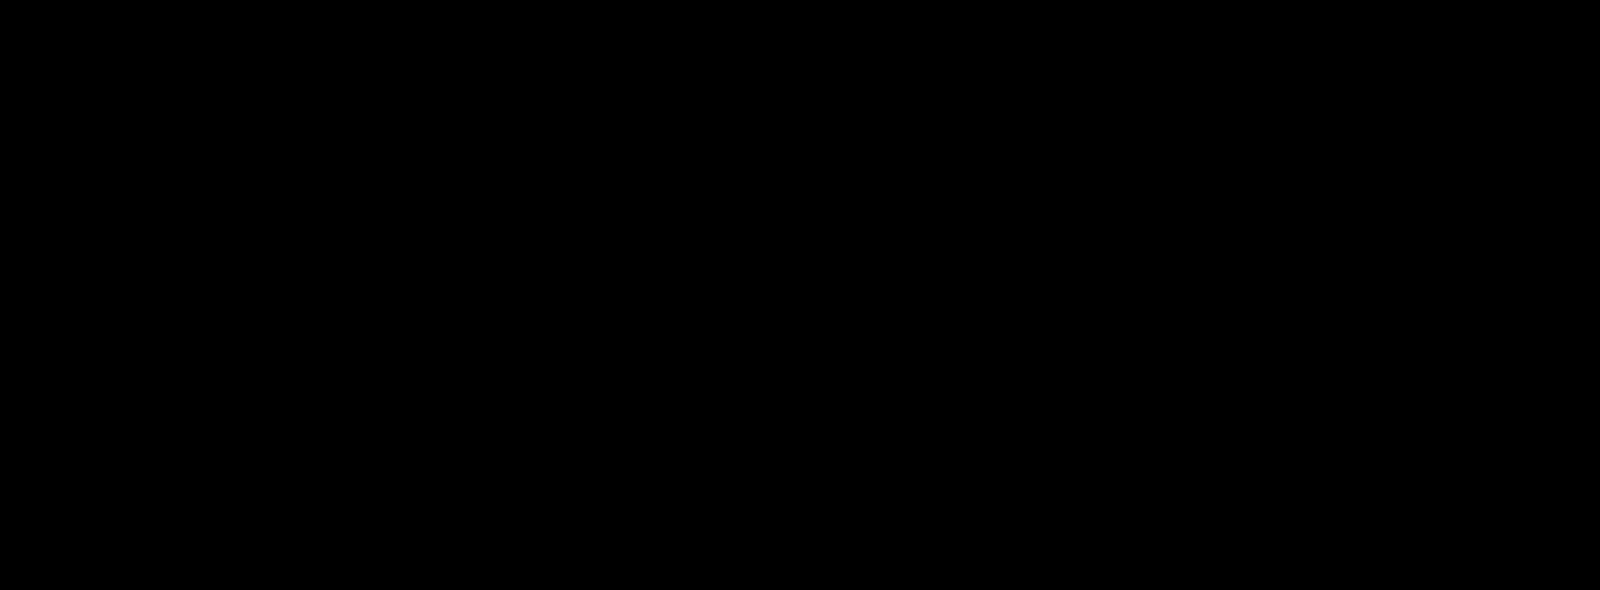 Aerocalminhas